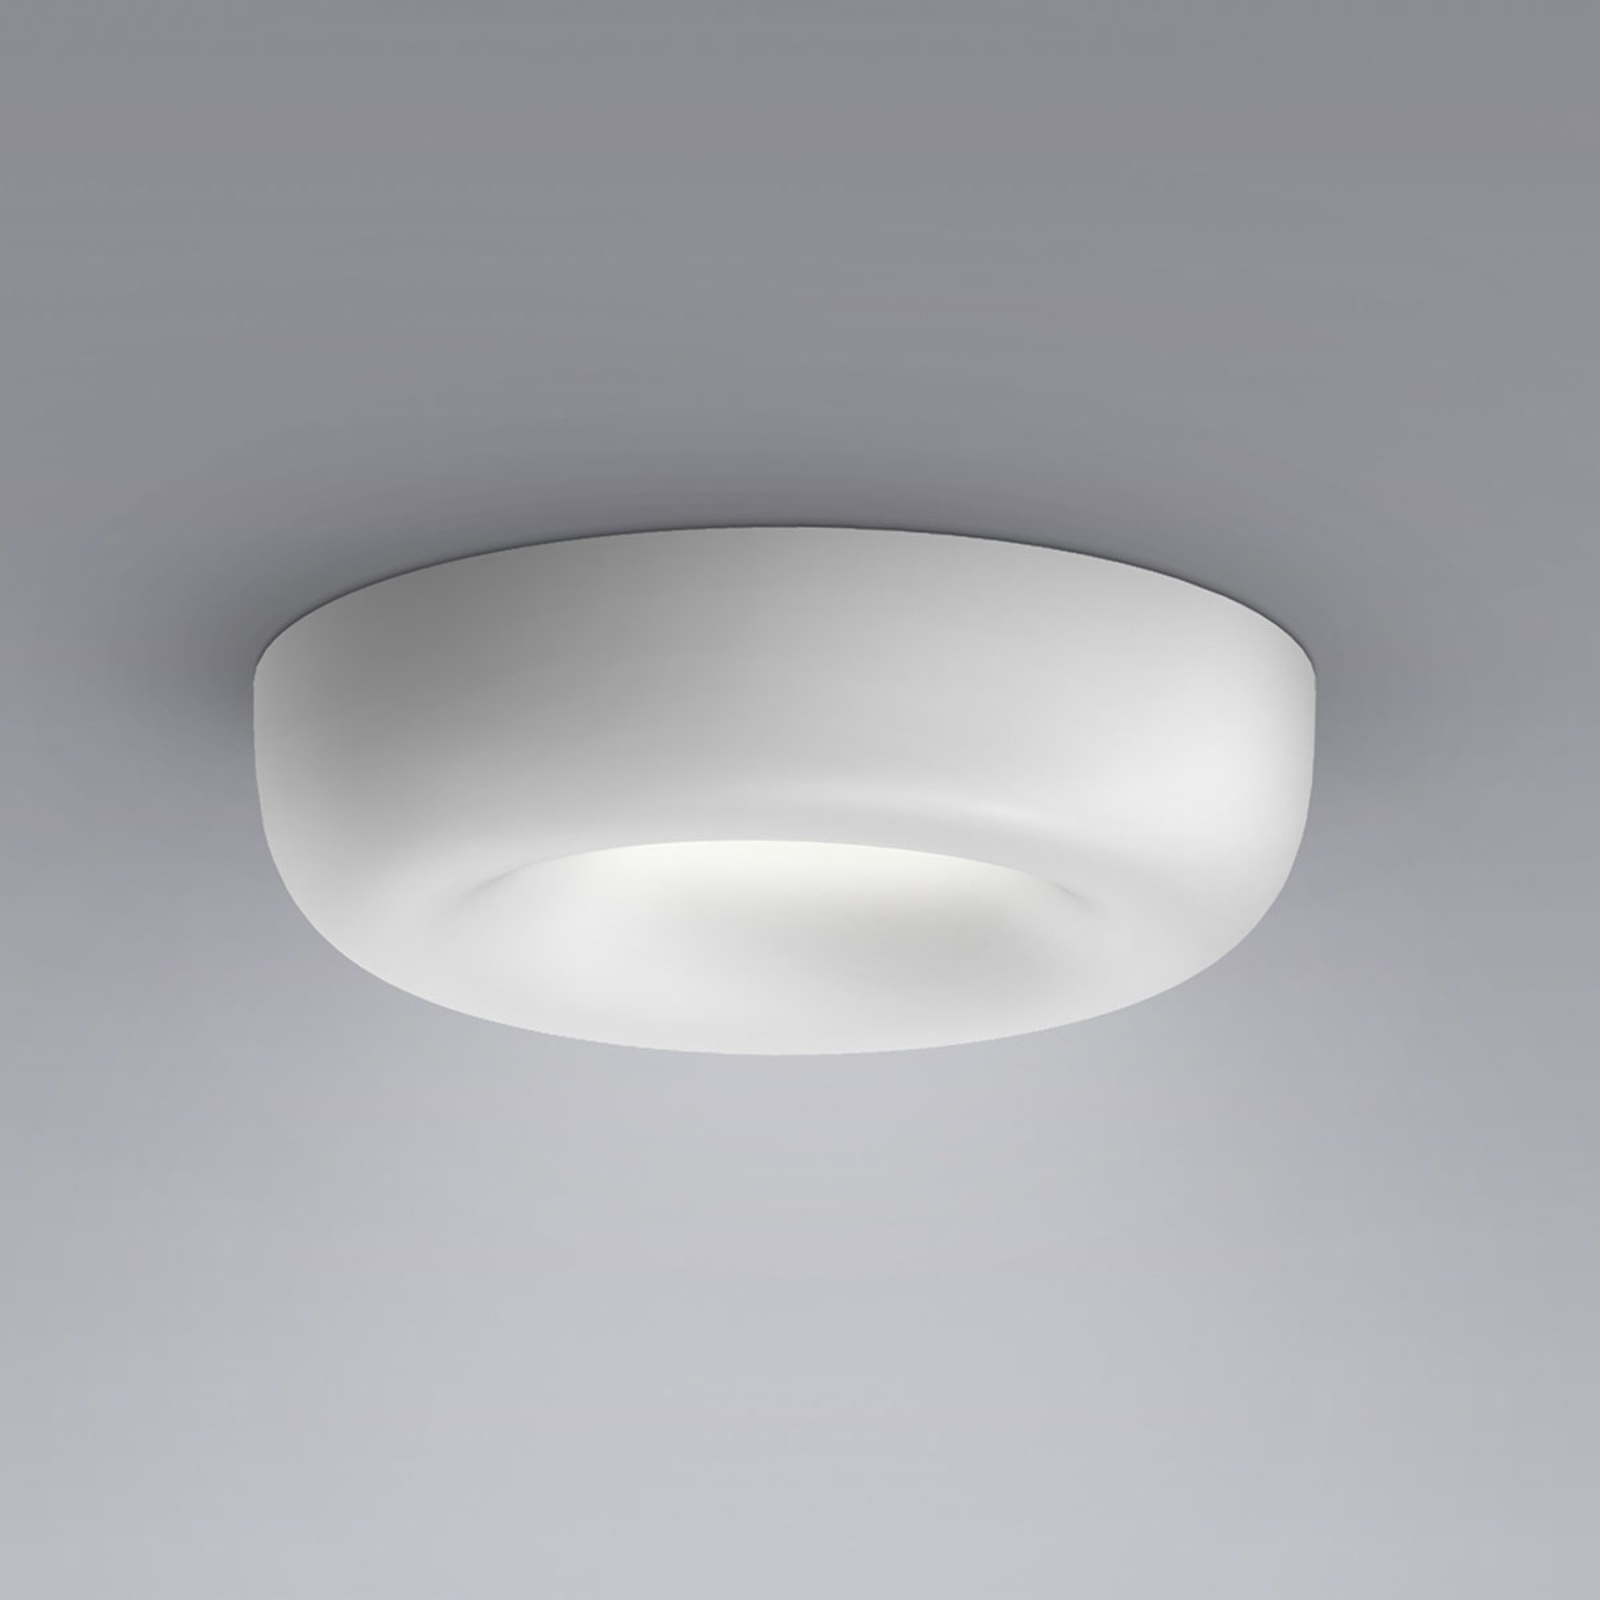 serien.lighting Cavity Recessed S, hvit